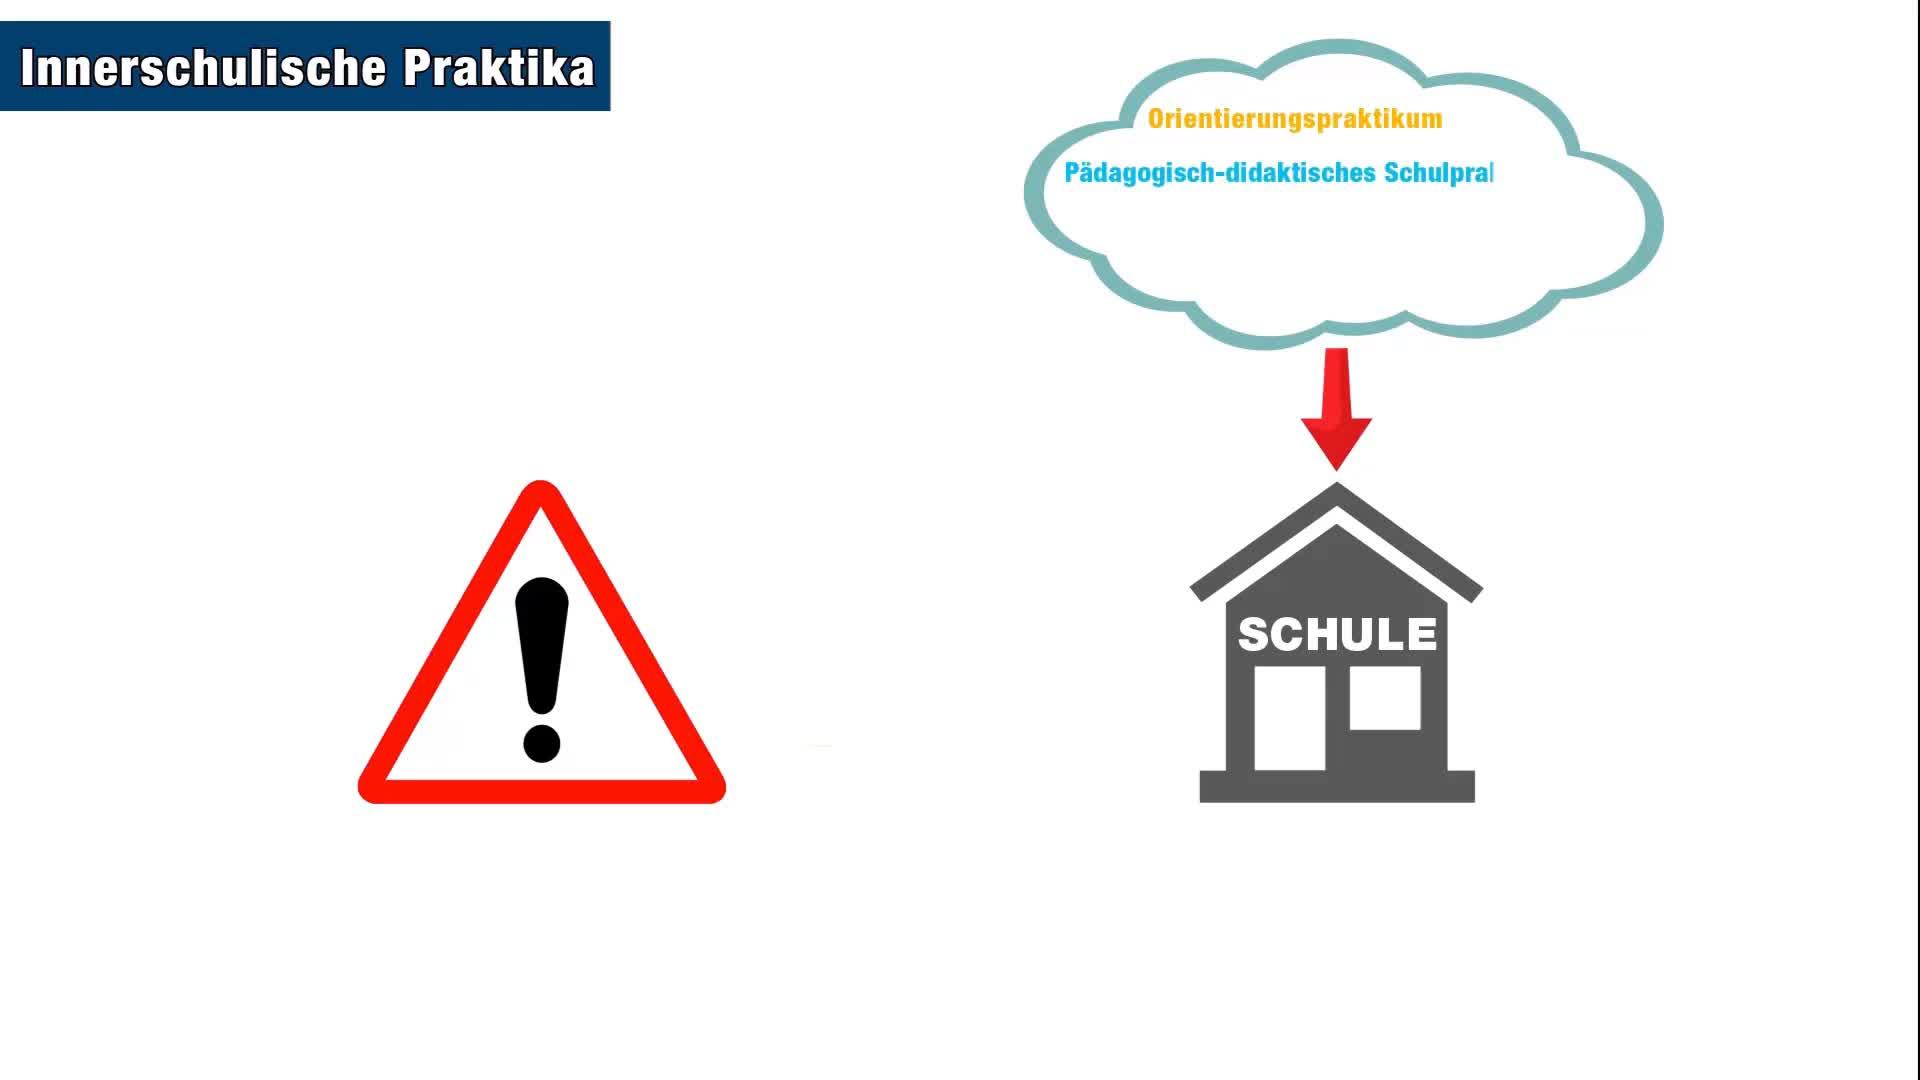 Lehramt   Gymnasium   Realschule   Praktika   Schule   ZfL preview image